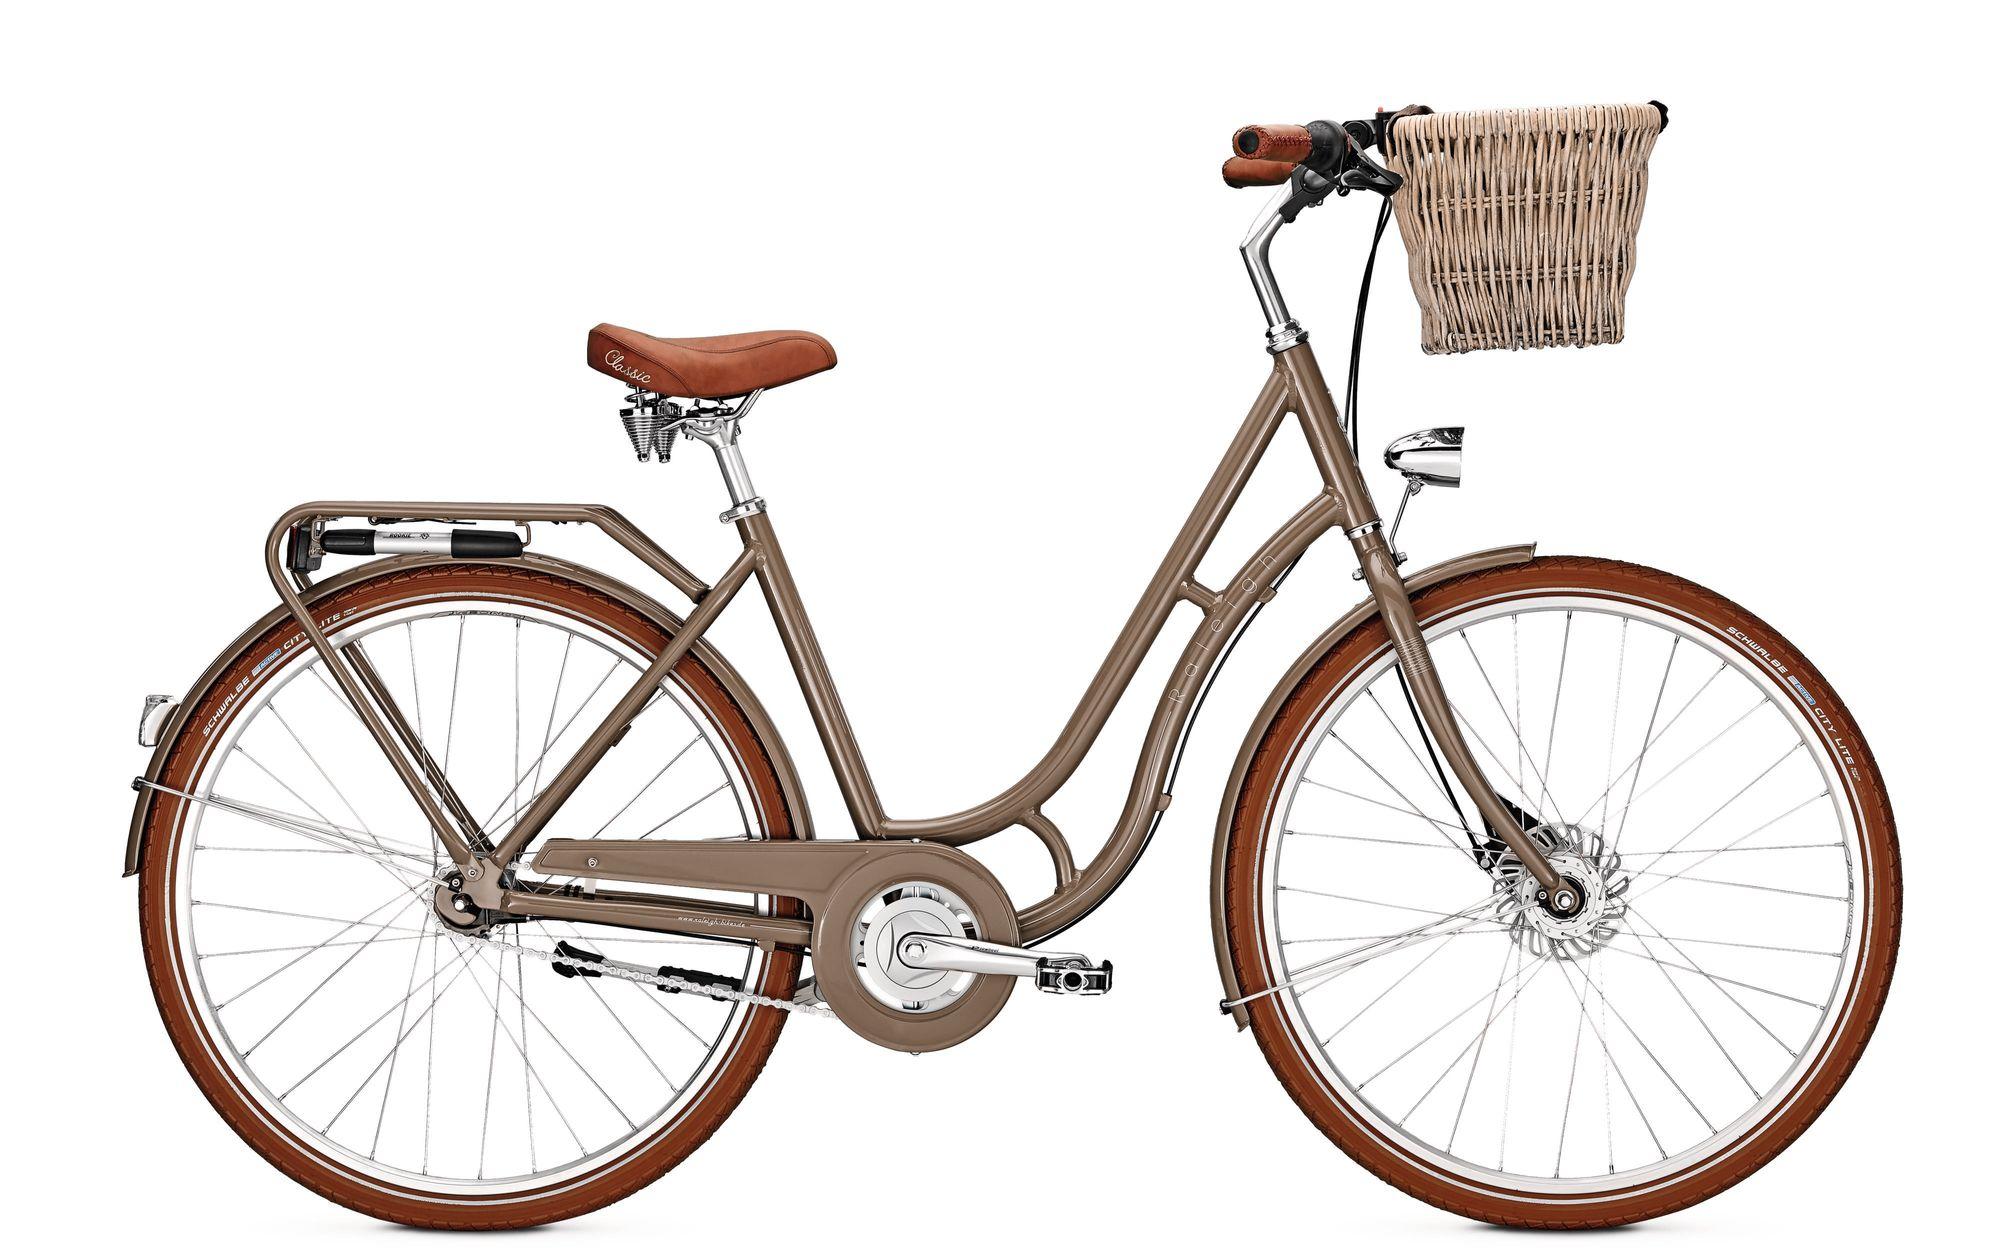 cityrad raleigh brighton 7 7g 28 zoll damen classic r cktritt radsport fahrr der cityr der. Black Bedroom Furniture Sets. Home Design Ideas